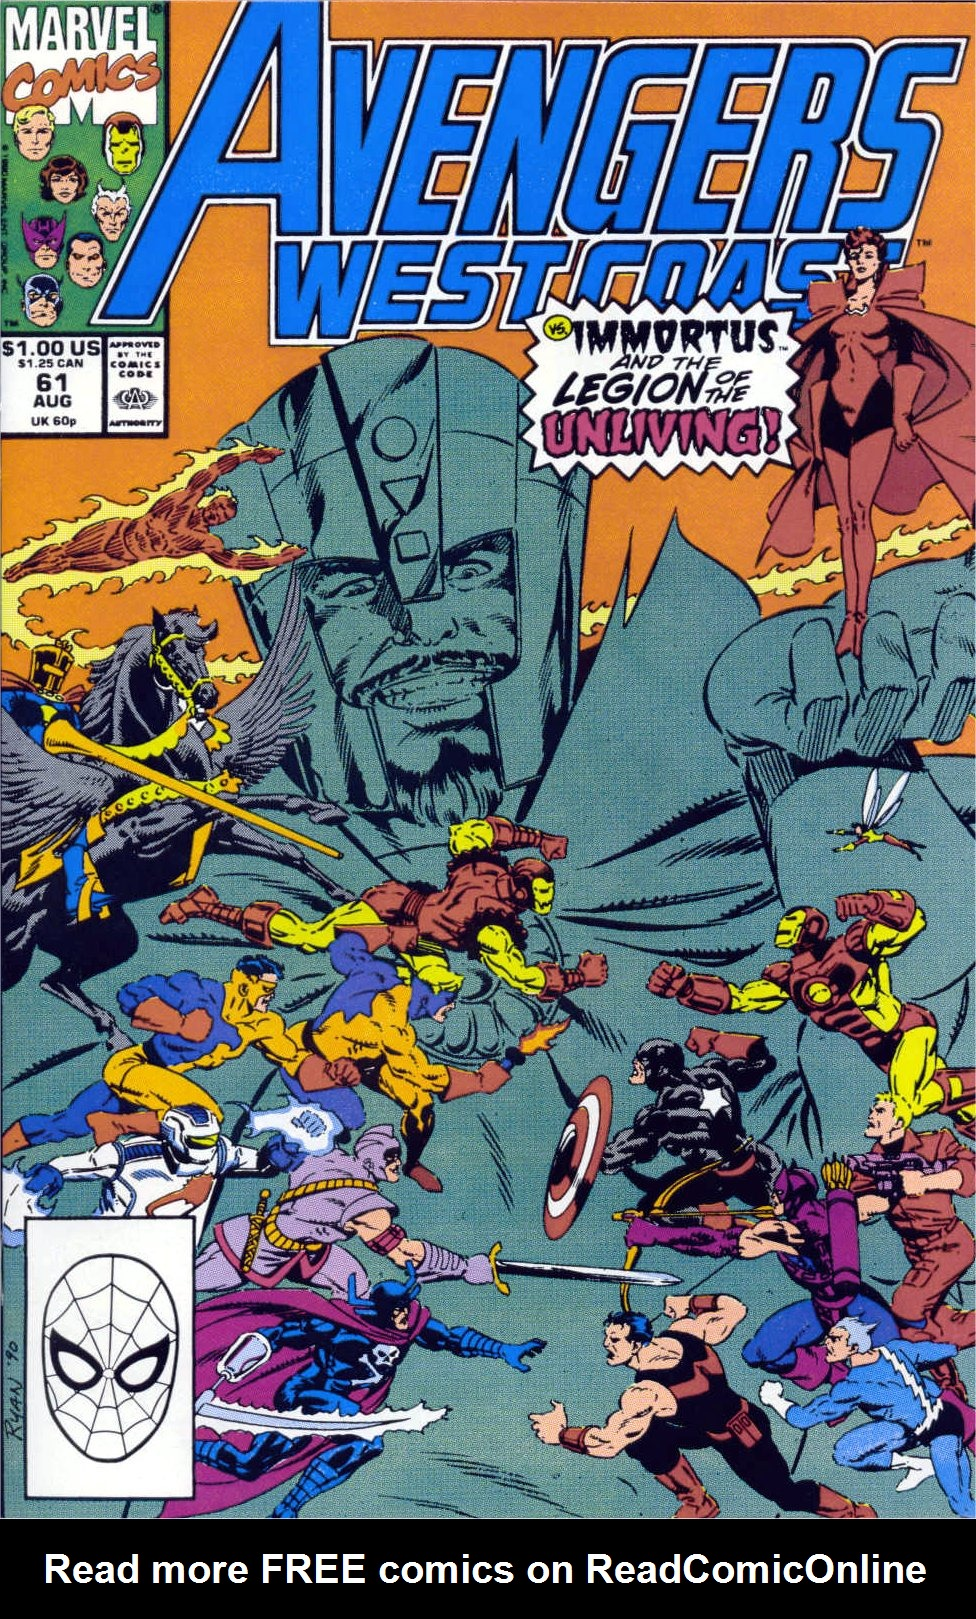 Avengers West Coast (1989) 61 Page 1